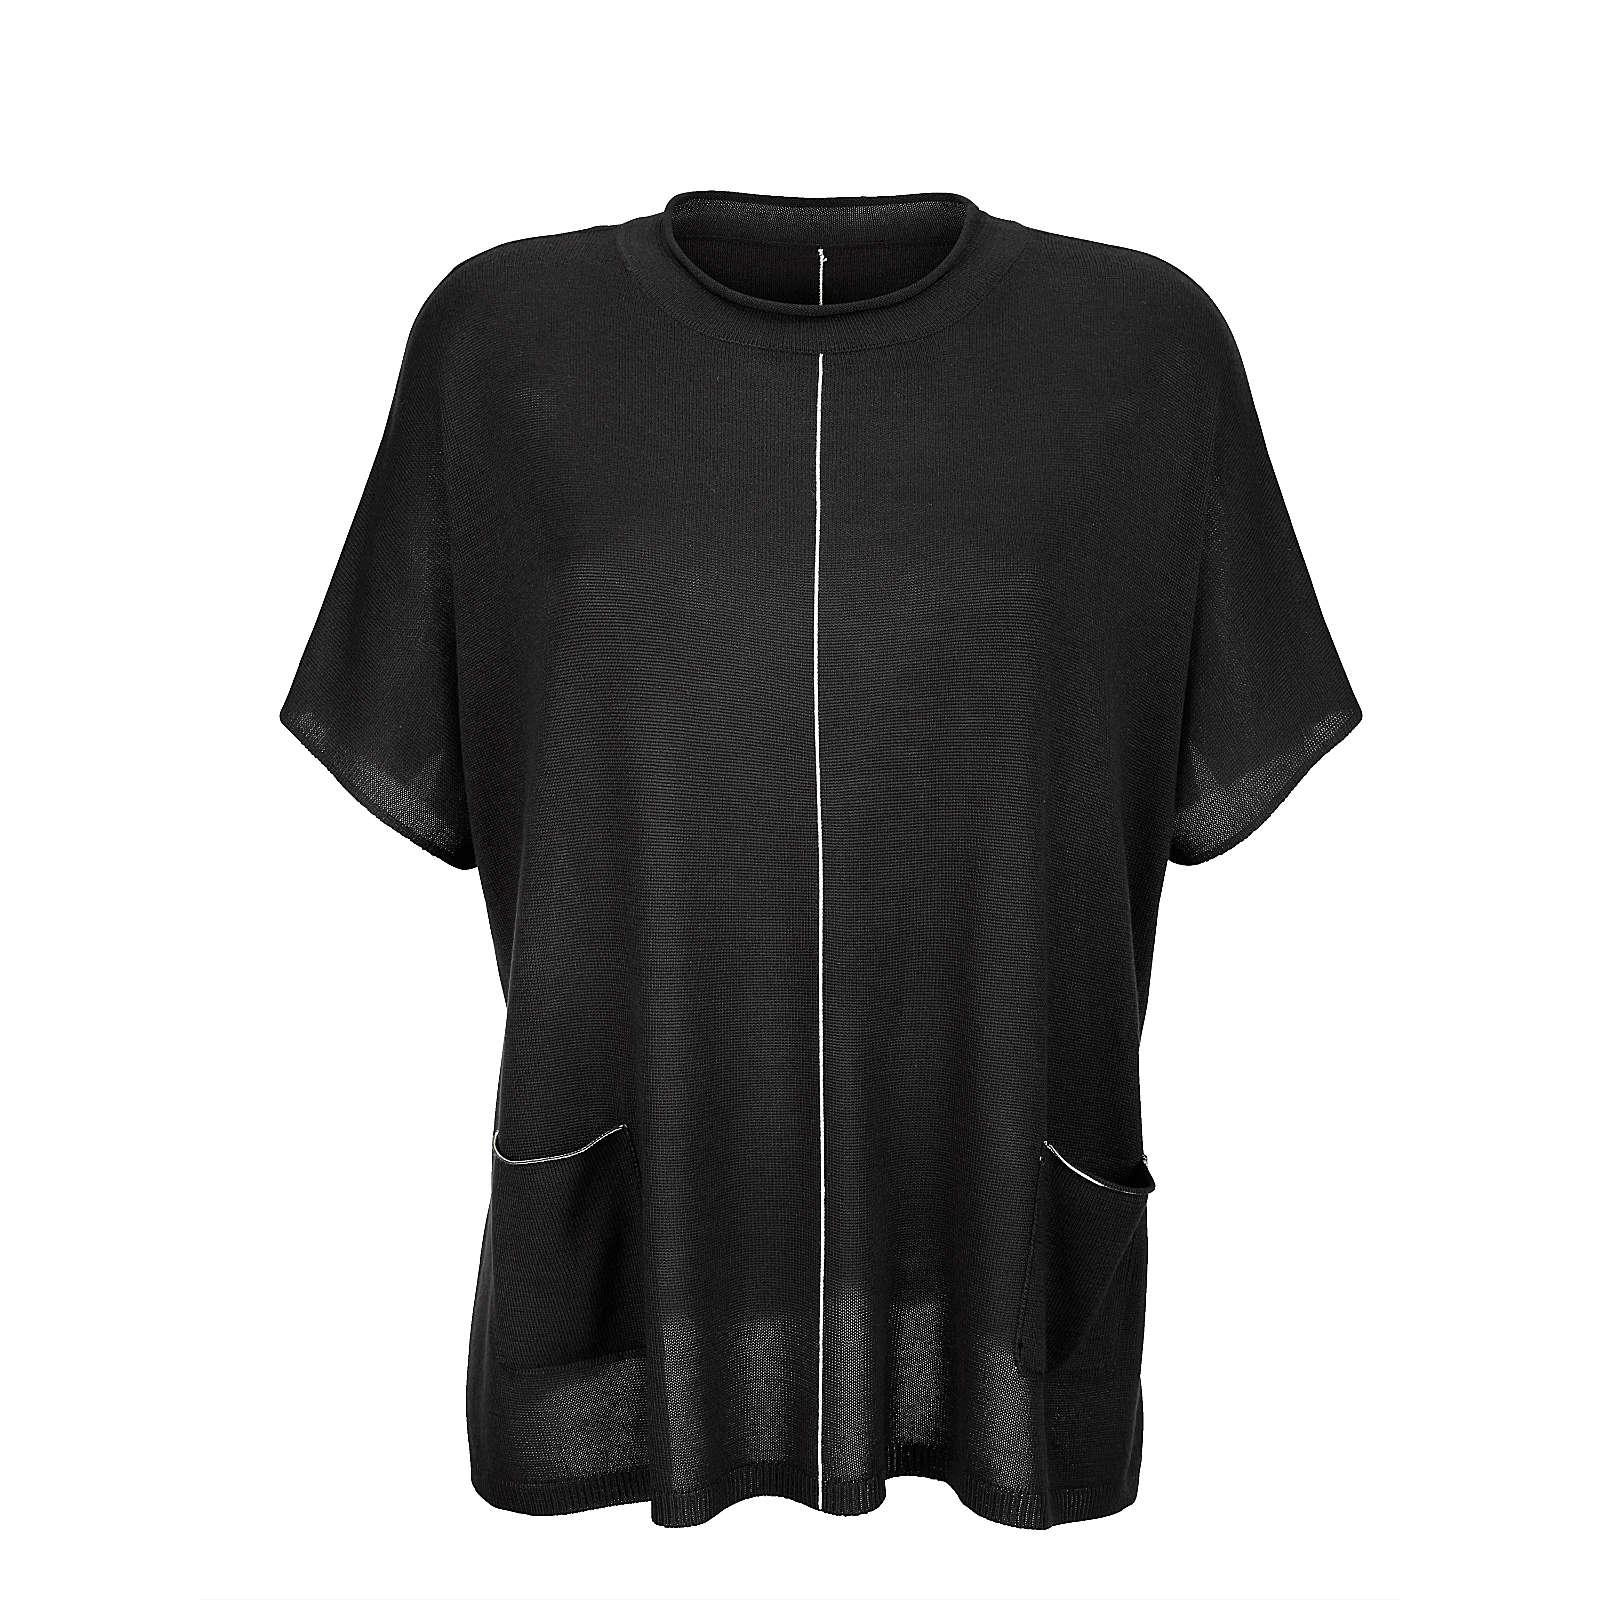 Alba Moda Pullover schwarz Damen Gr. 36/38